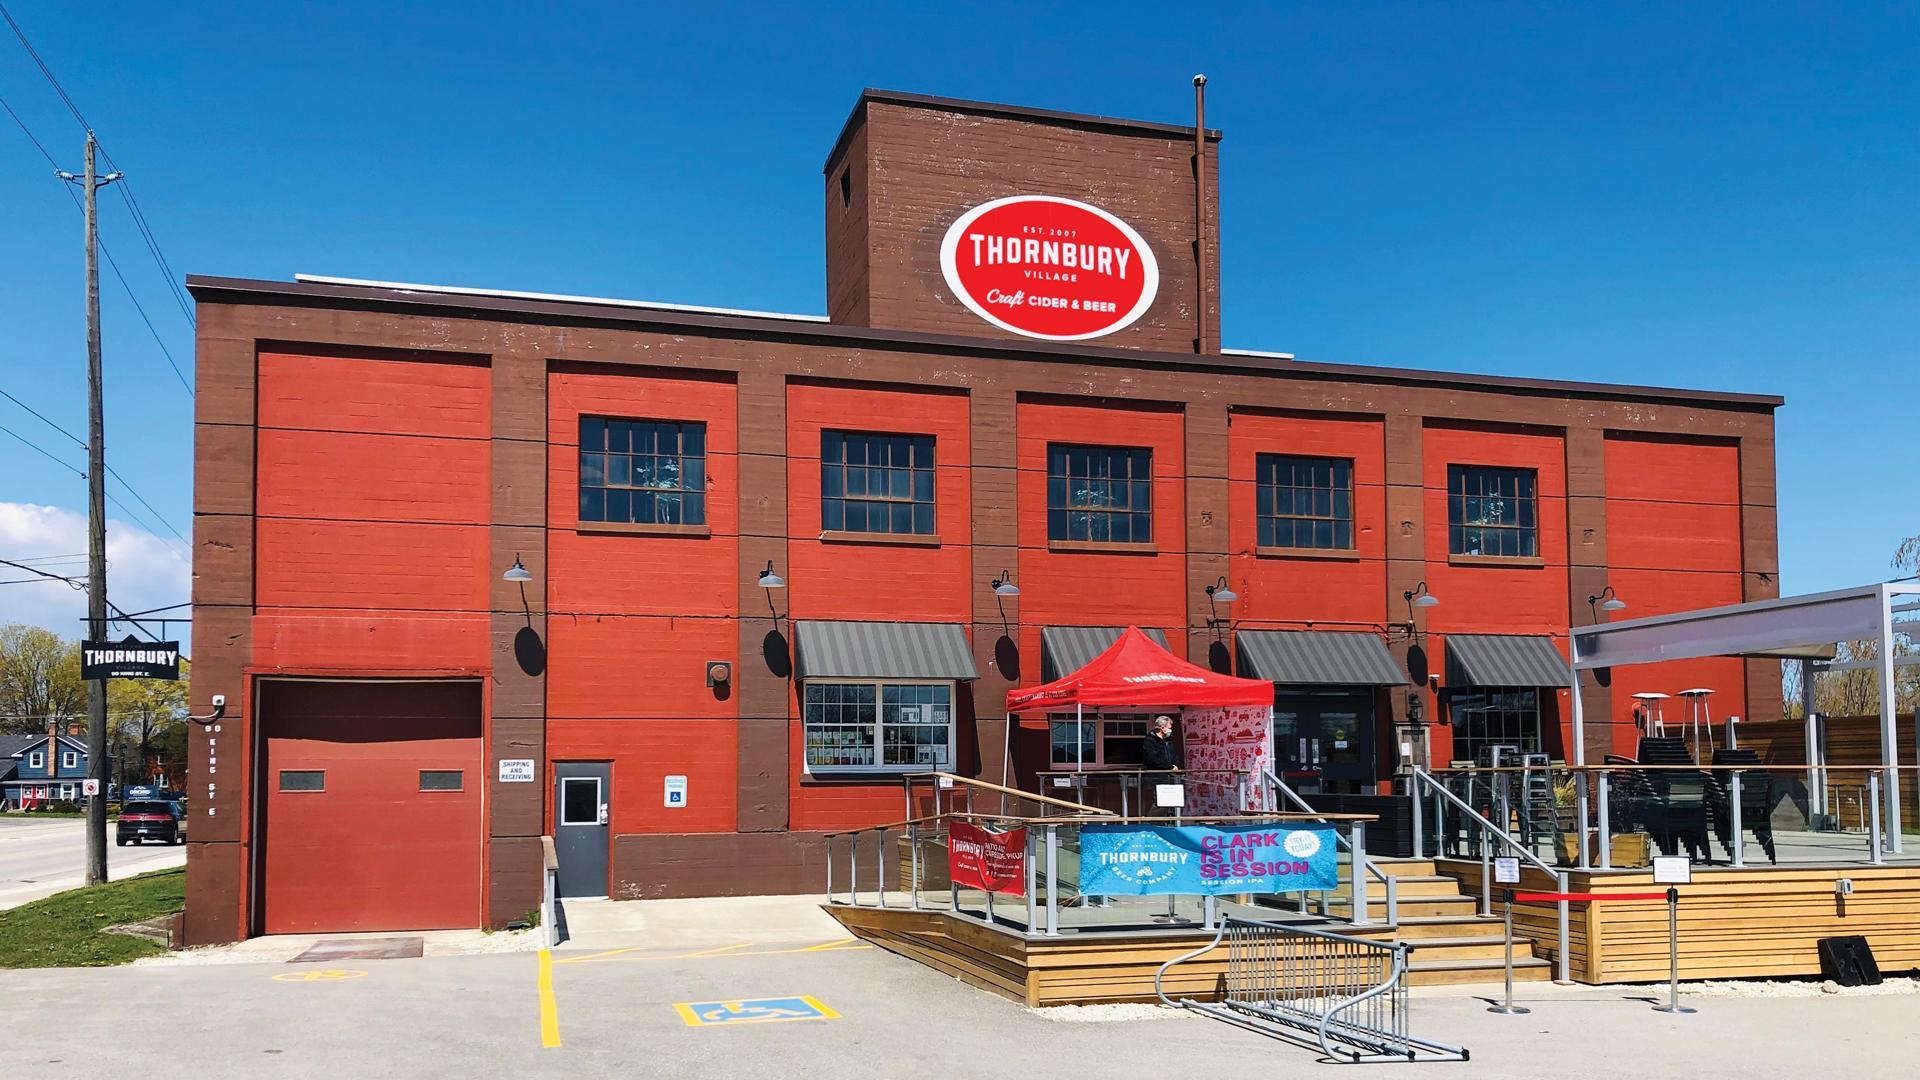 Thornbury Premium Apple Cider | The Thornbury Cider and Brew House